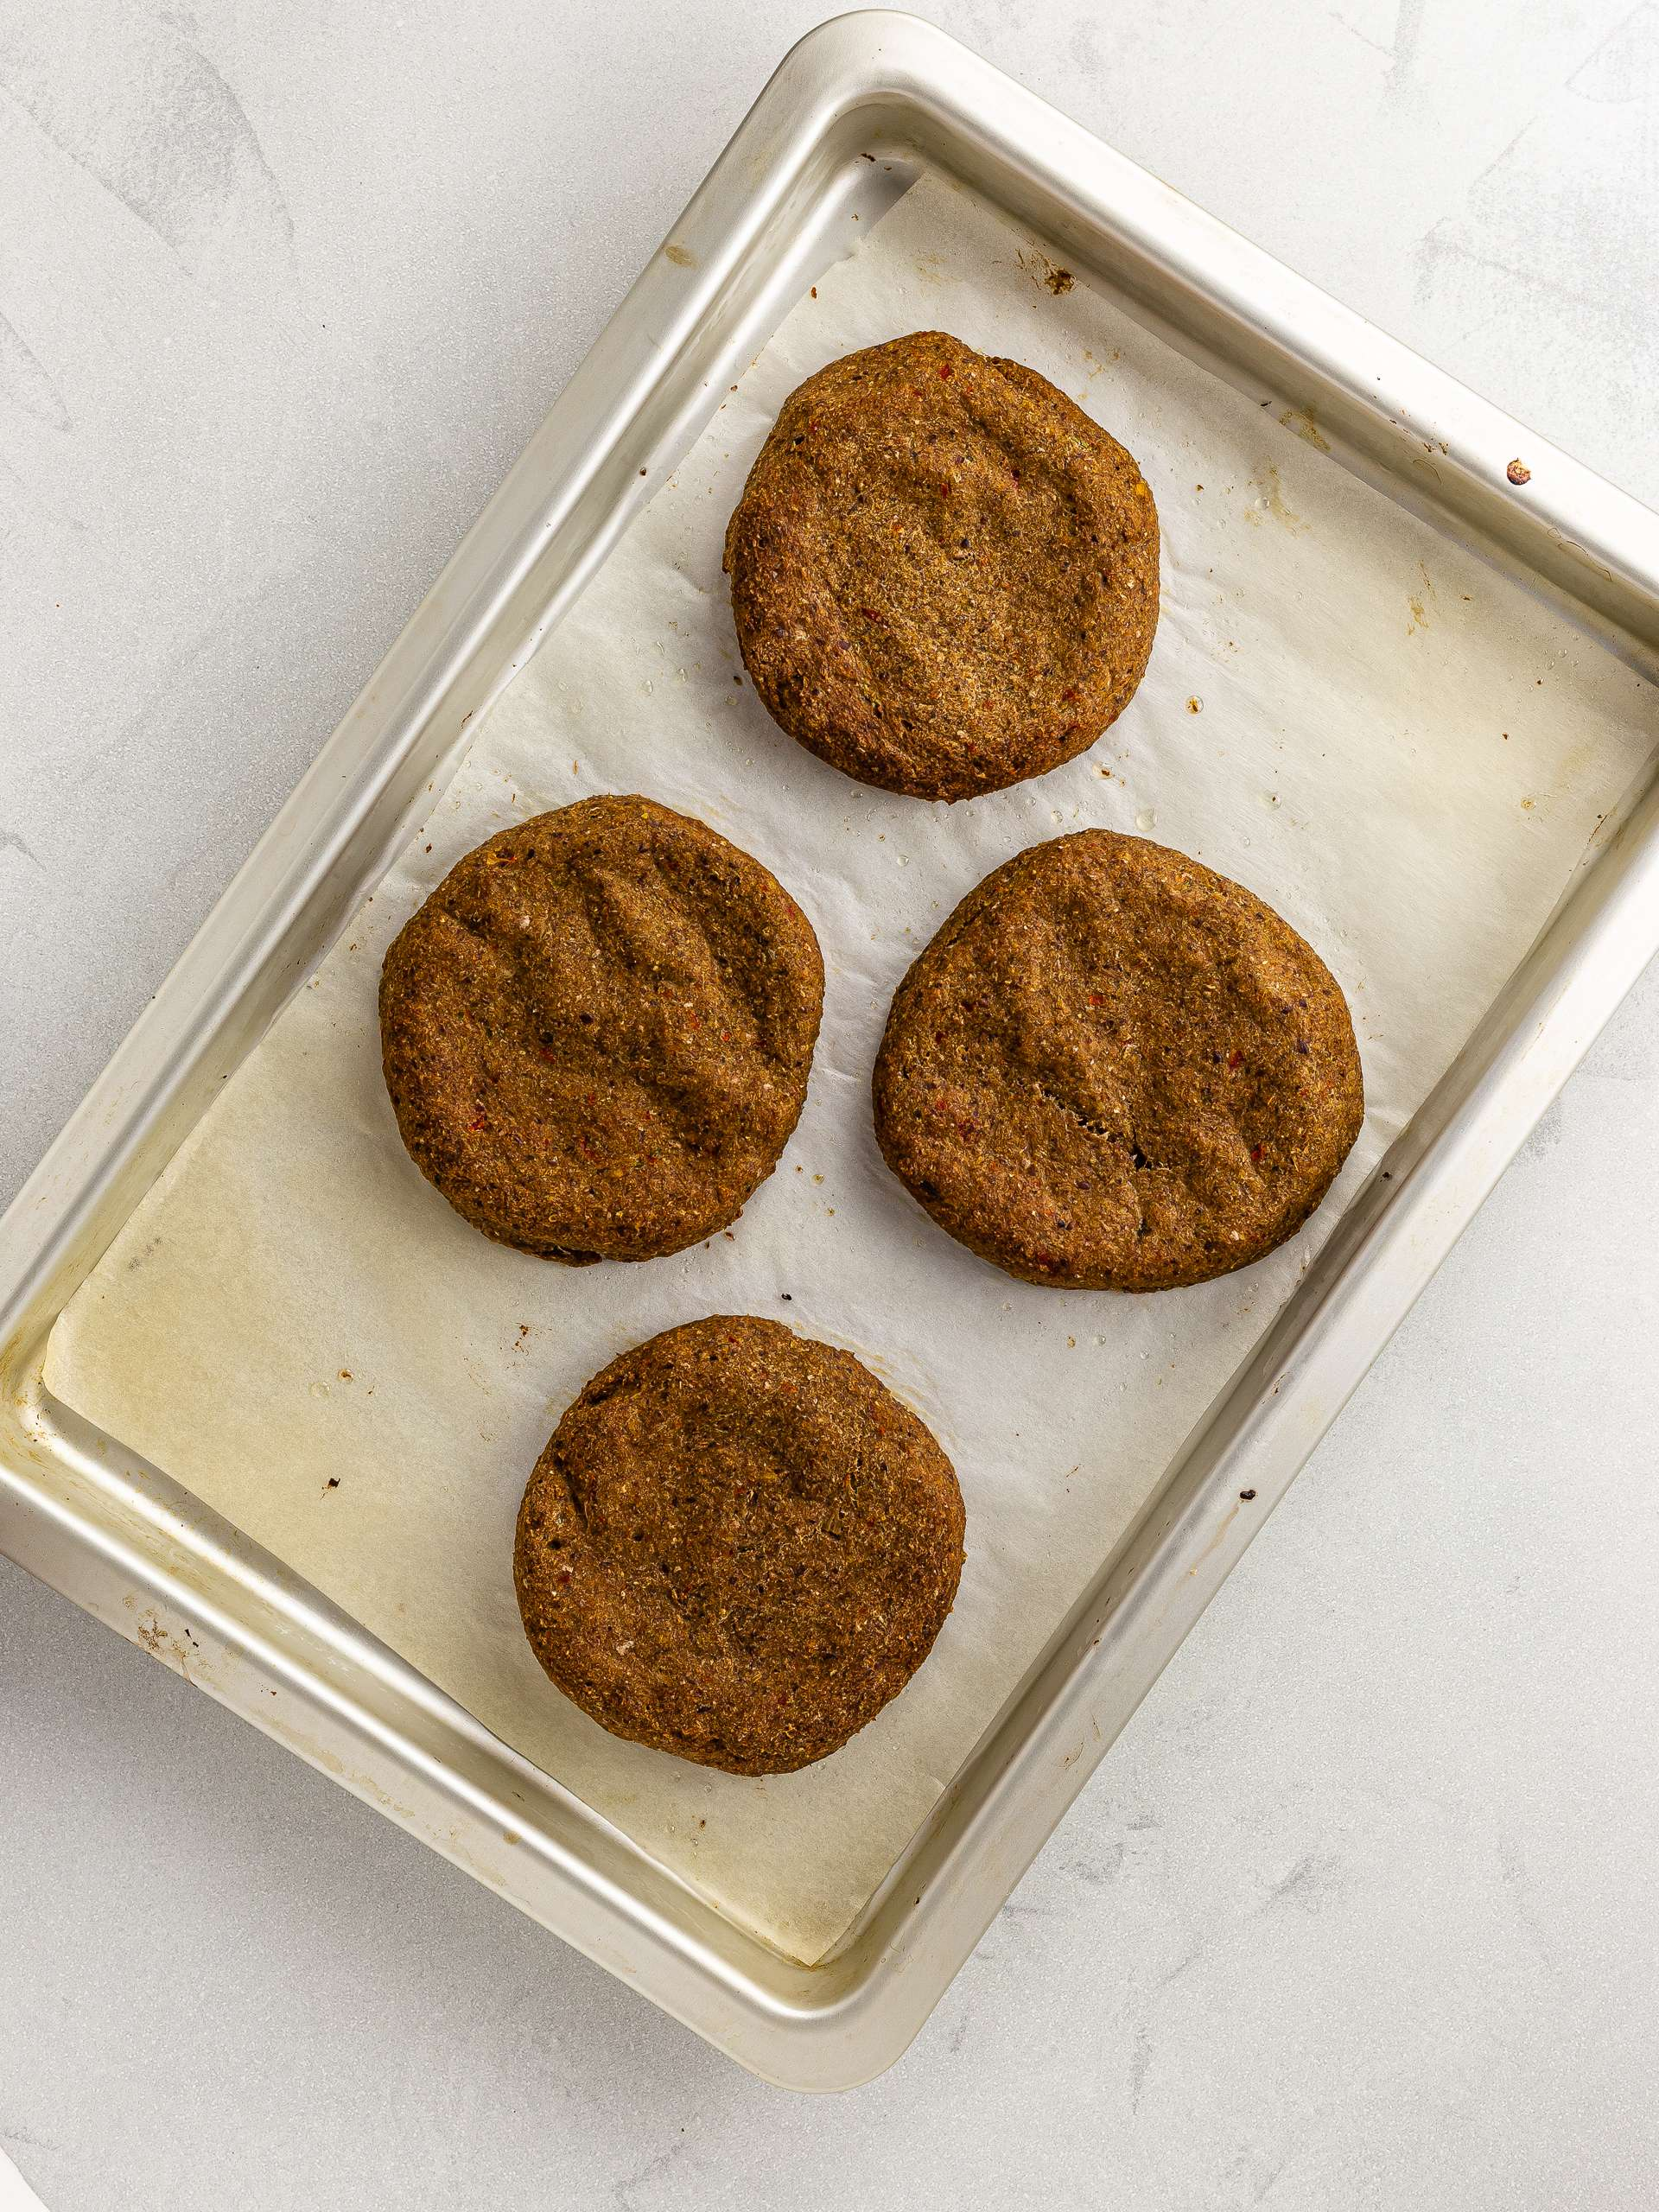 oven-baked jackfruit burger patties